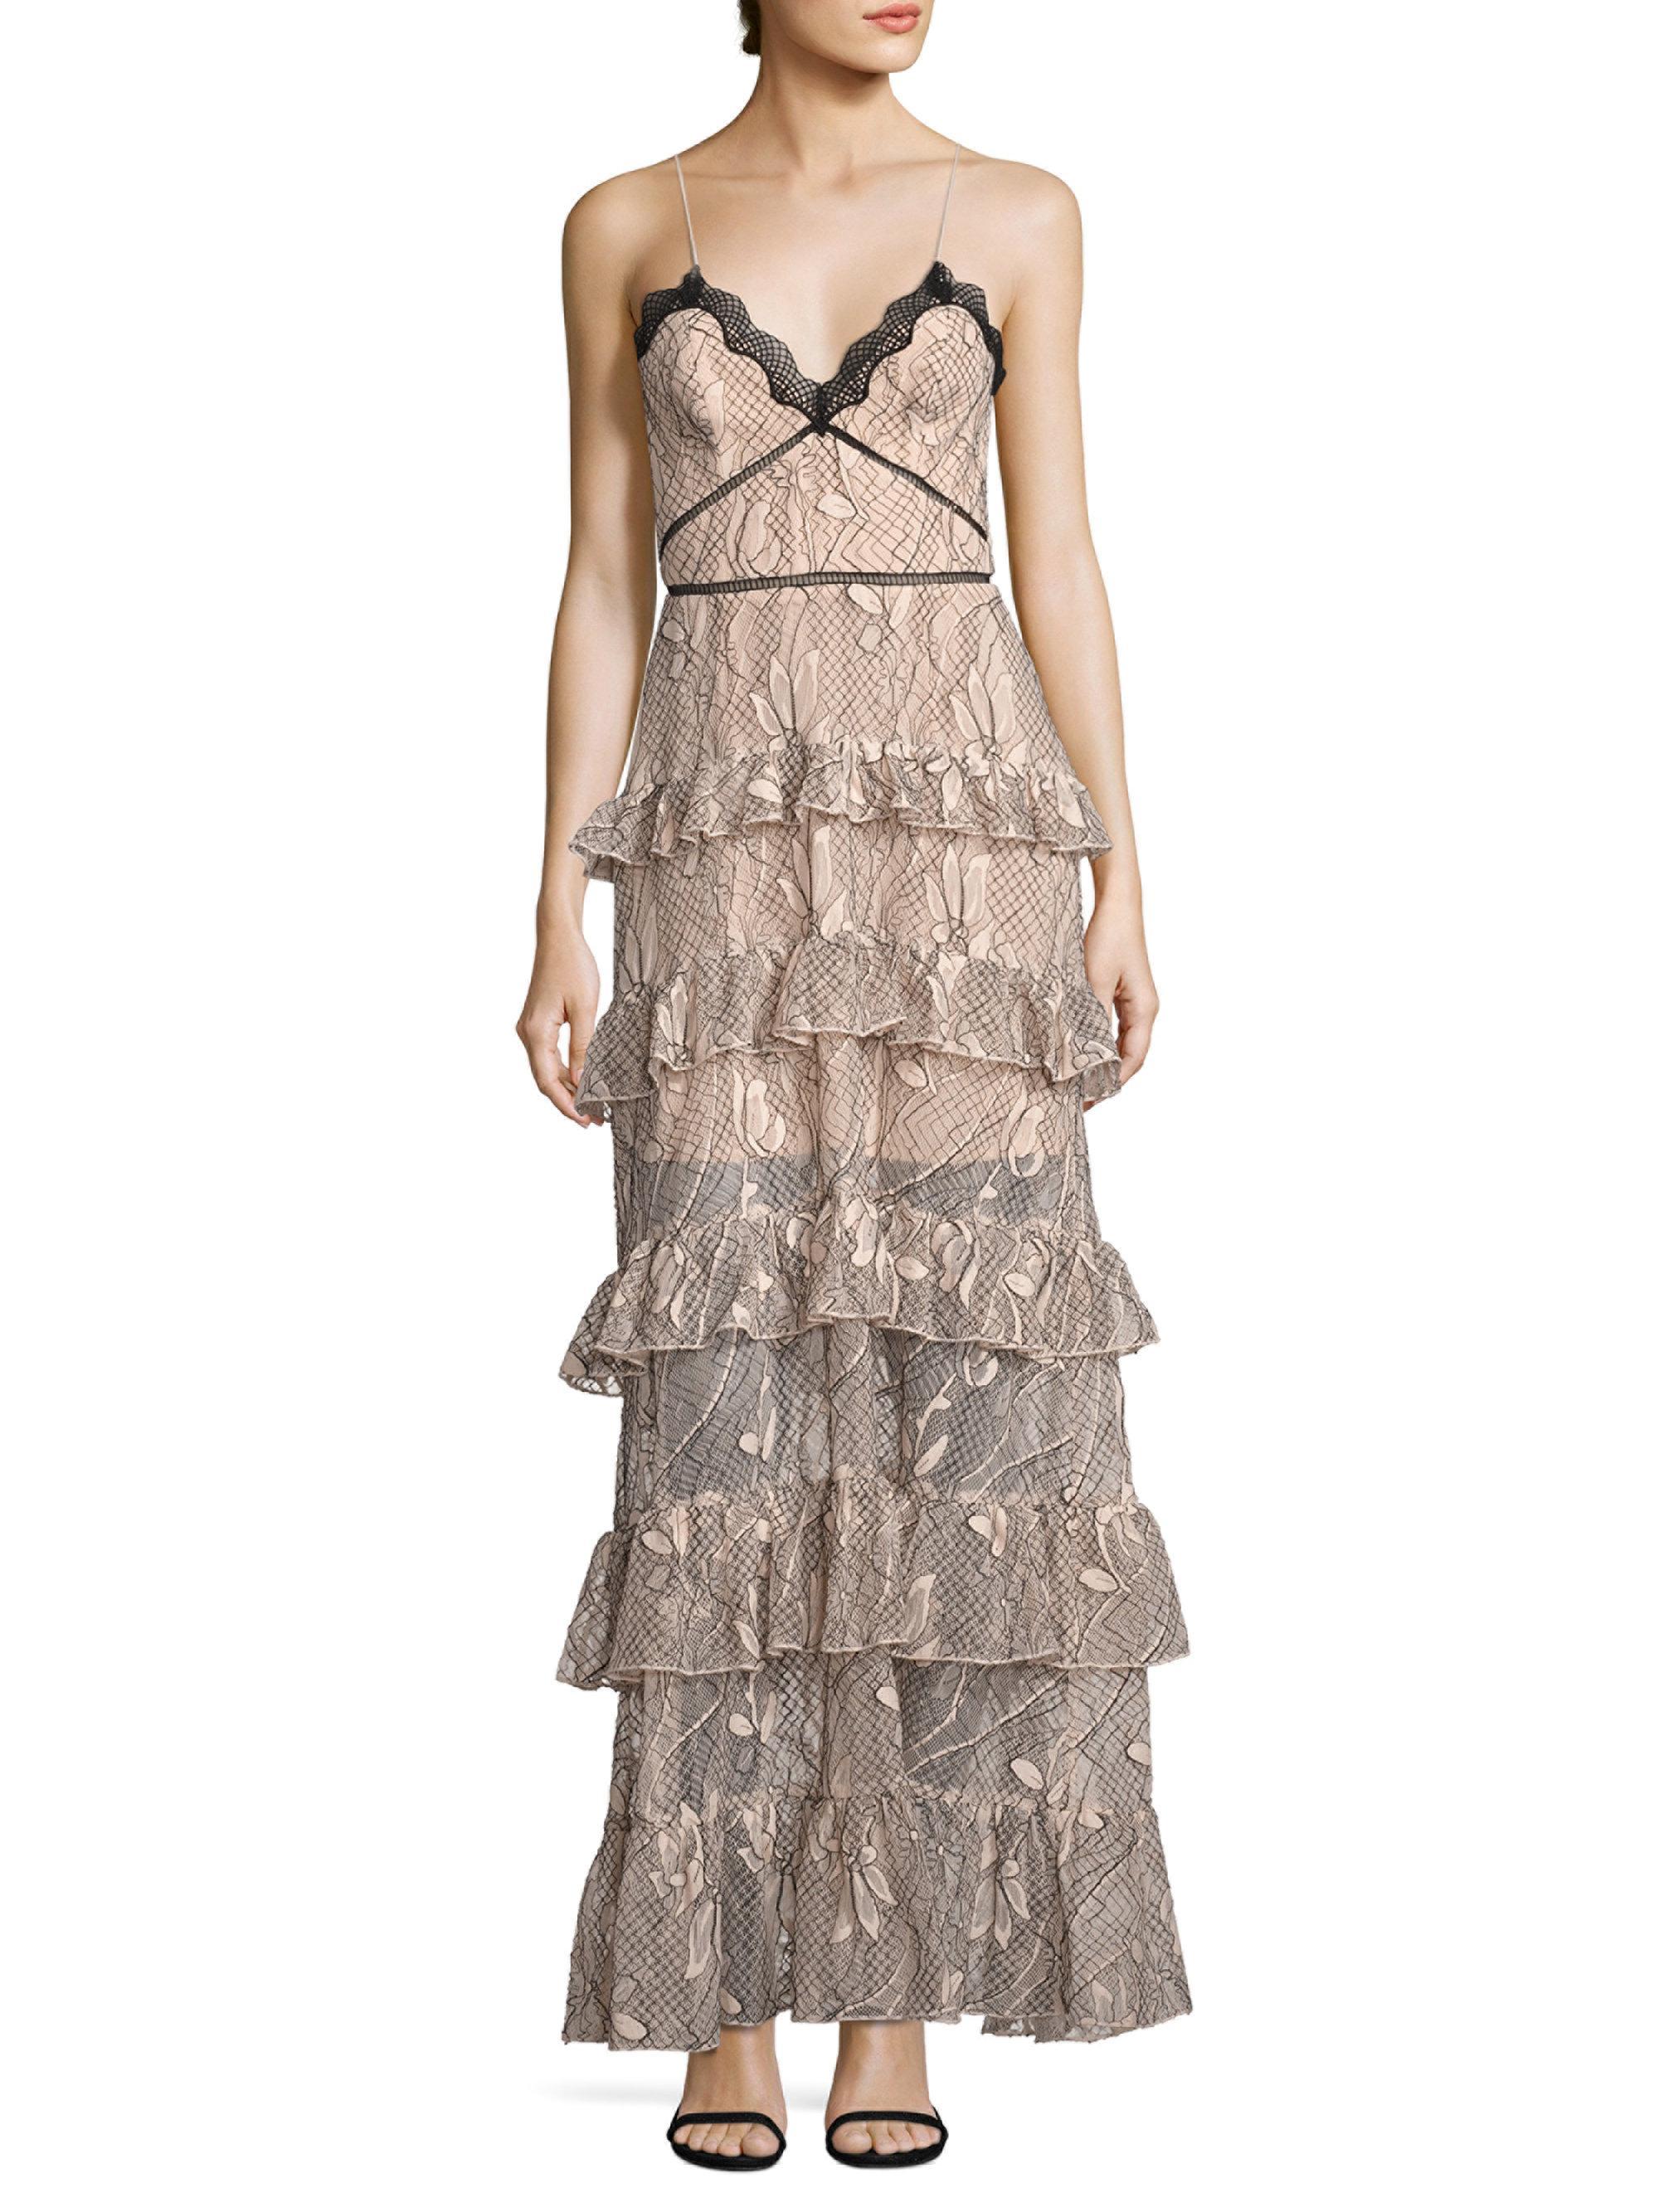 0a277855746 Nicholas Iris Lace Ruffled Gown - Lyst